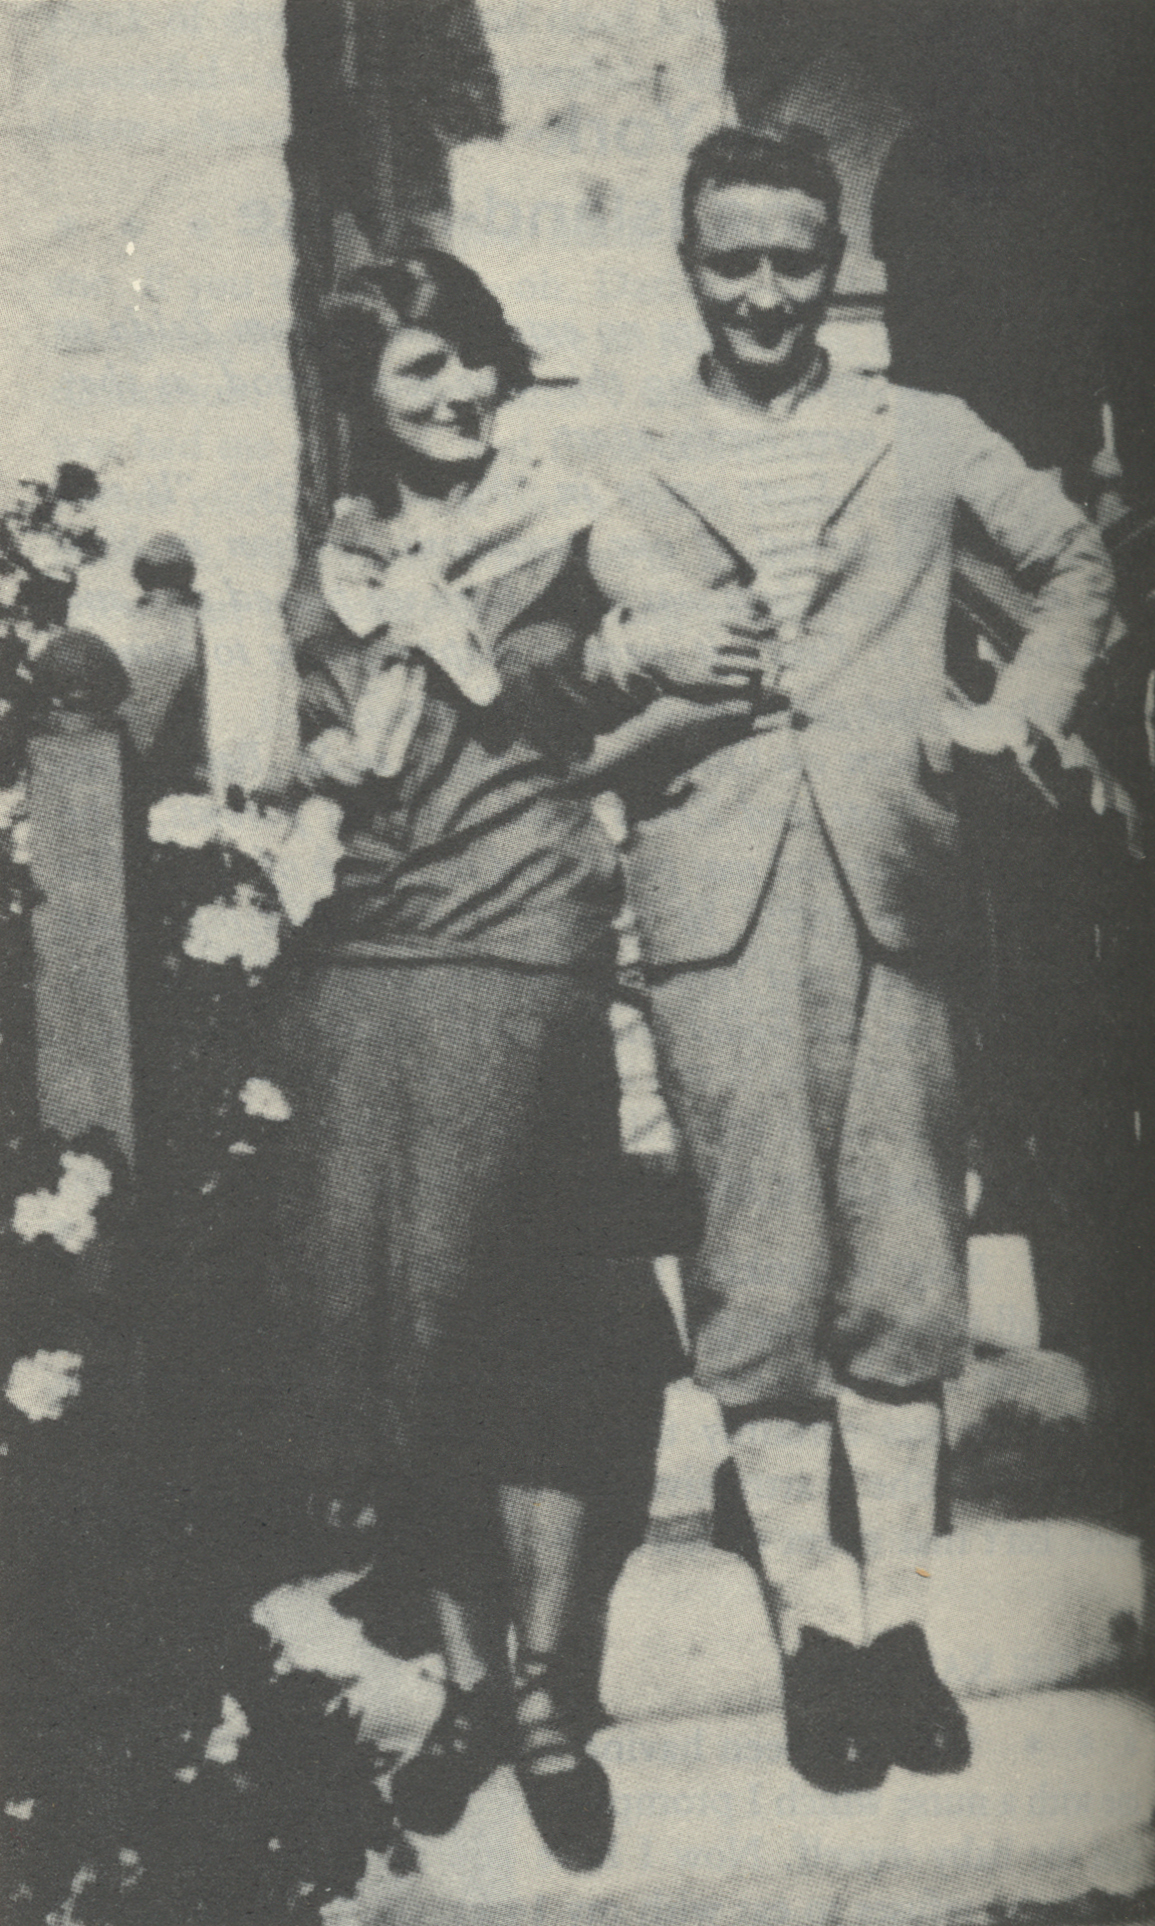 Urassaya Sperbund,Gerard Kelly (1959?010) Adult movies Lolit Solis (b. 1947),Eliot Makeham (1882?956)